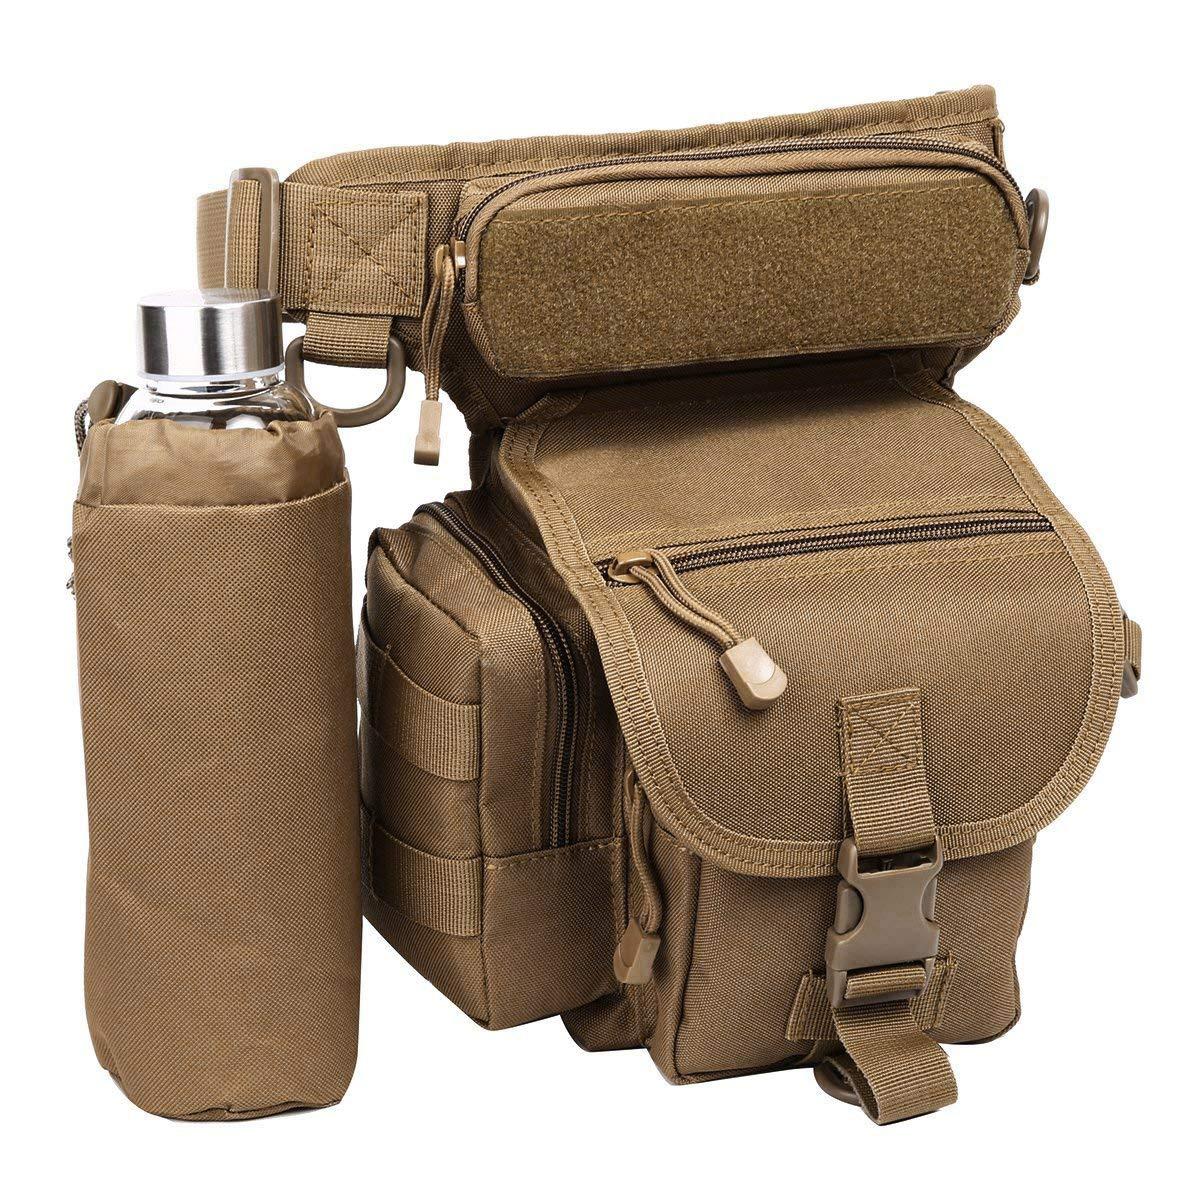 Eshow Men's Drop Leg Pouch Tools Bags Tactical Leg Bag Purse Fanny Pack Thigh Bags Bike Cycling Hip Bag Canvas Eshow-BFT000201